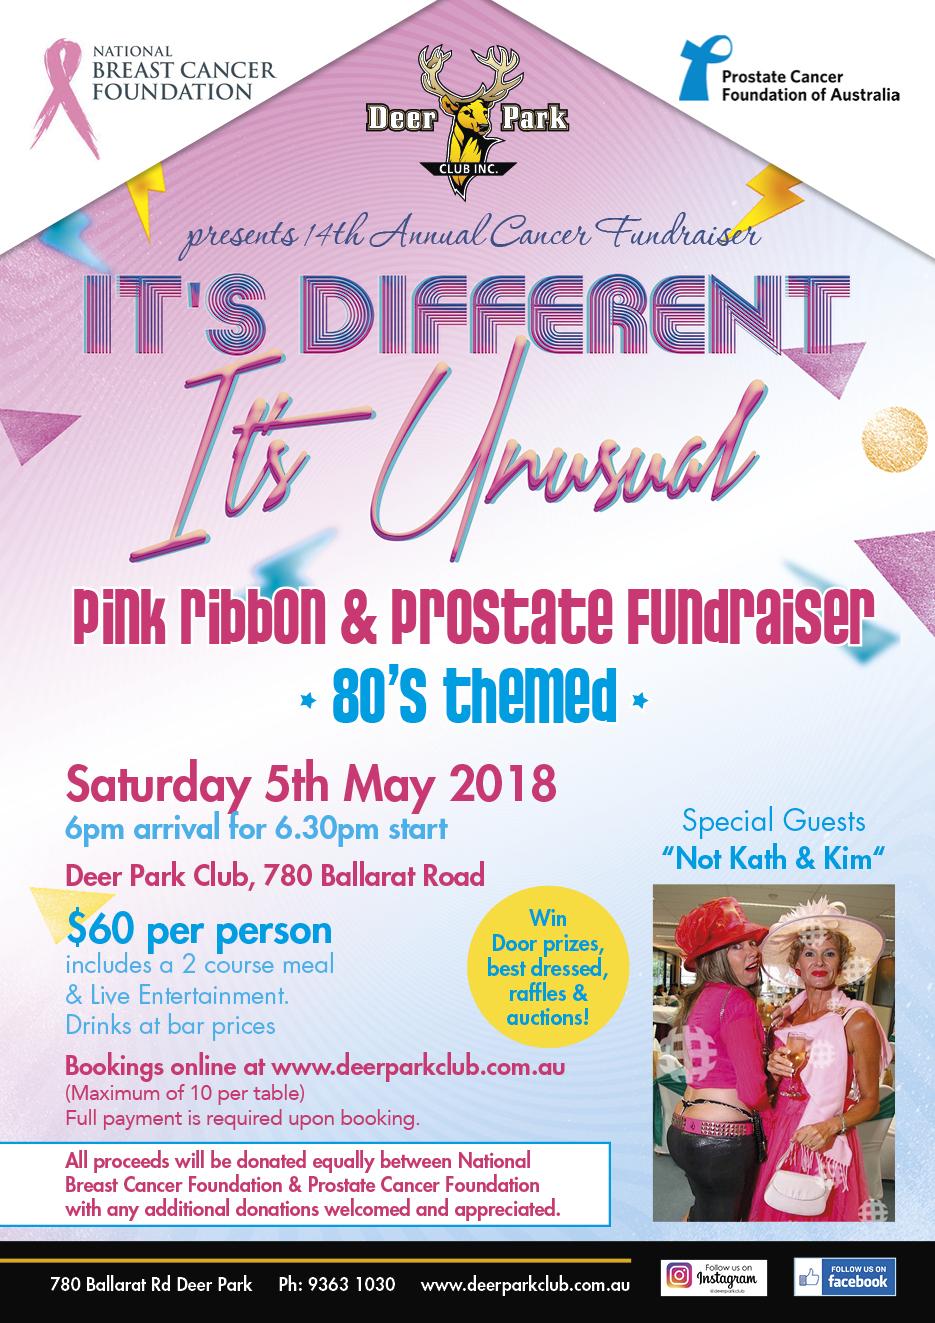 Pink Ribbon & Prostate